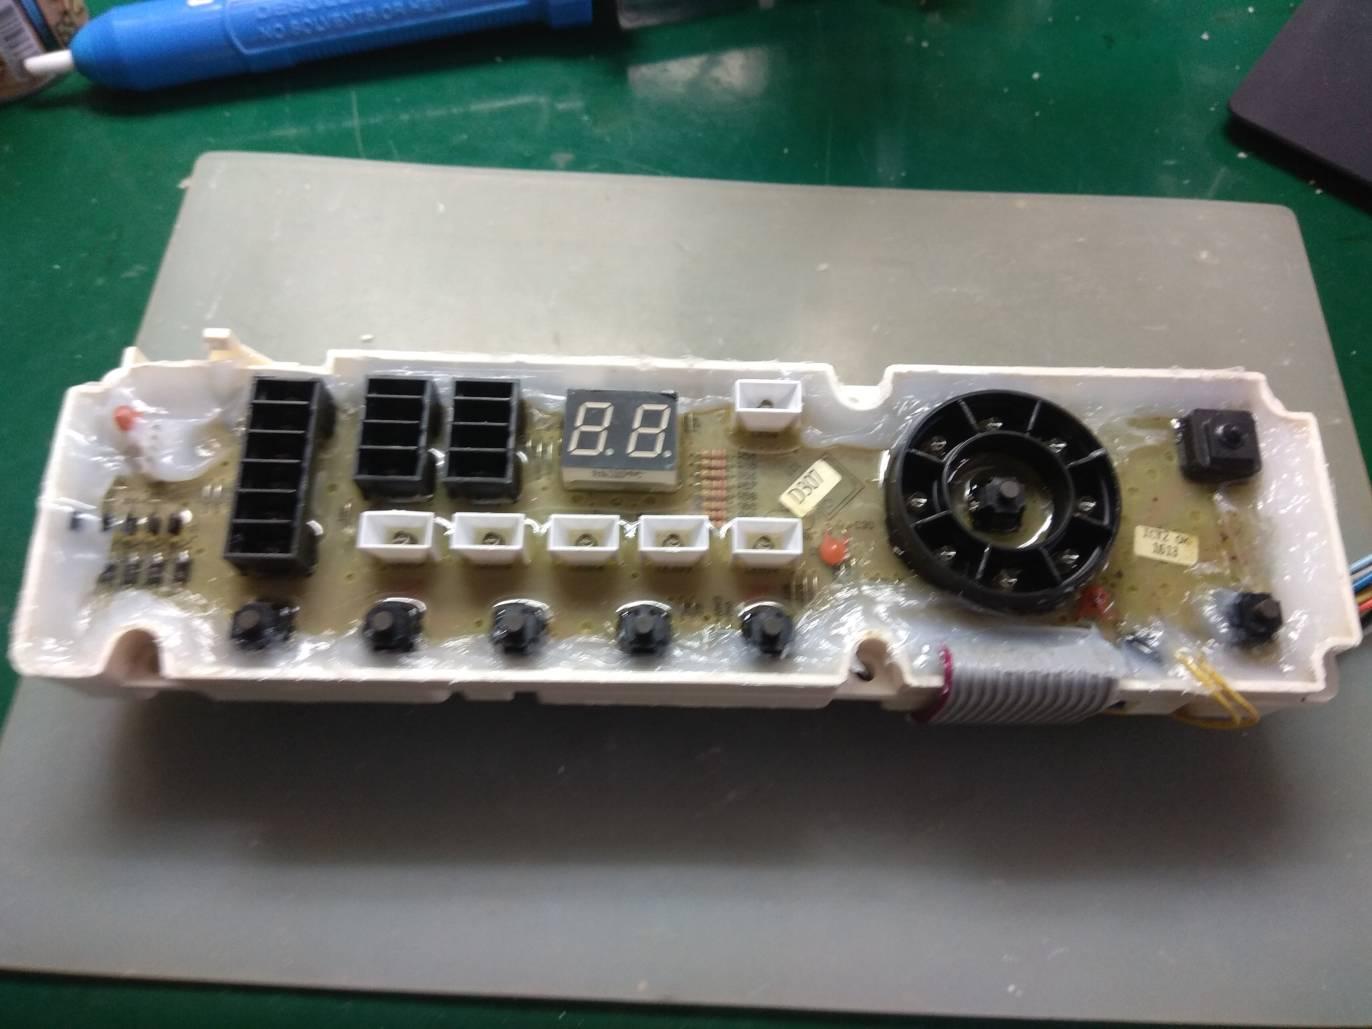 高動維修: SANYO 臺灣三洋 SANLUX 洗衣機 SW-13UF3/SW-13UF8 開機後閃一下即不顯示 (E7)